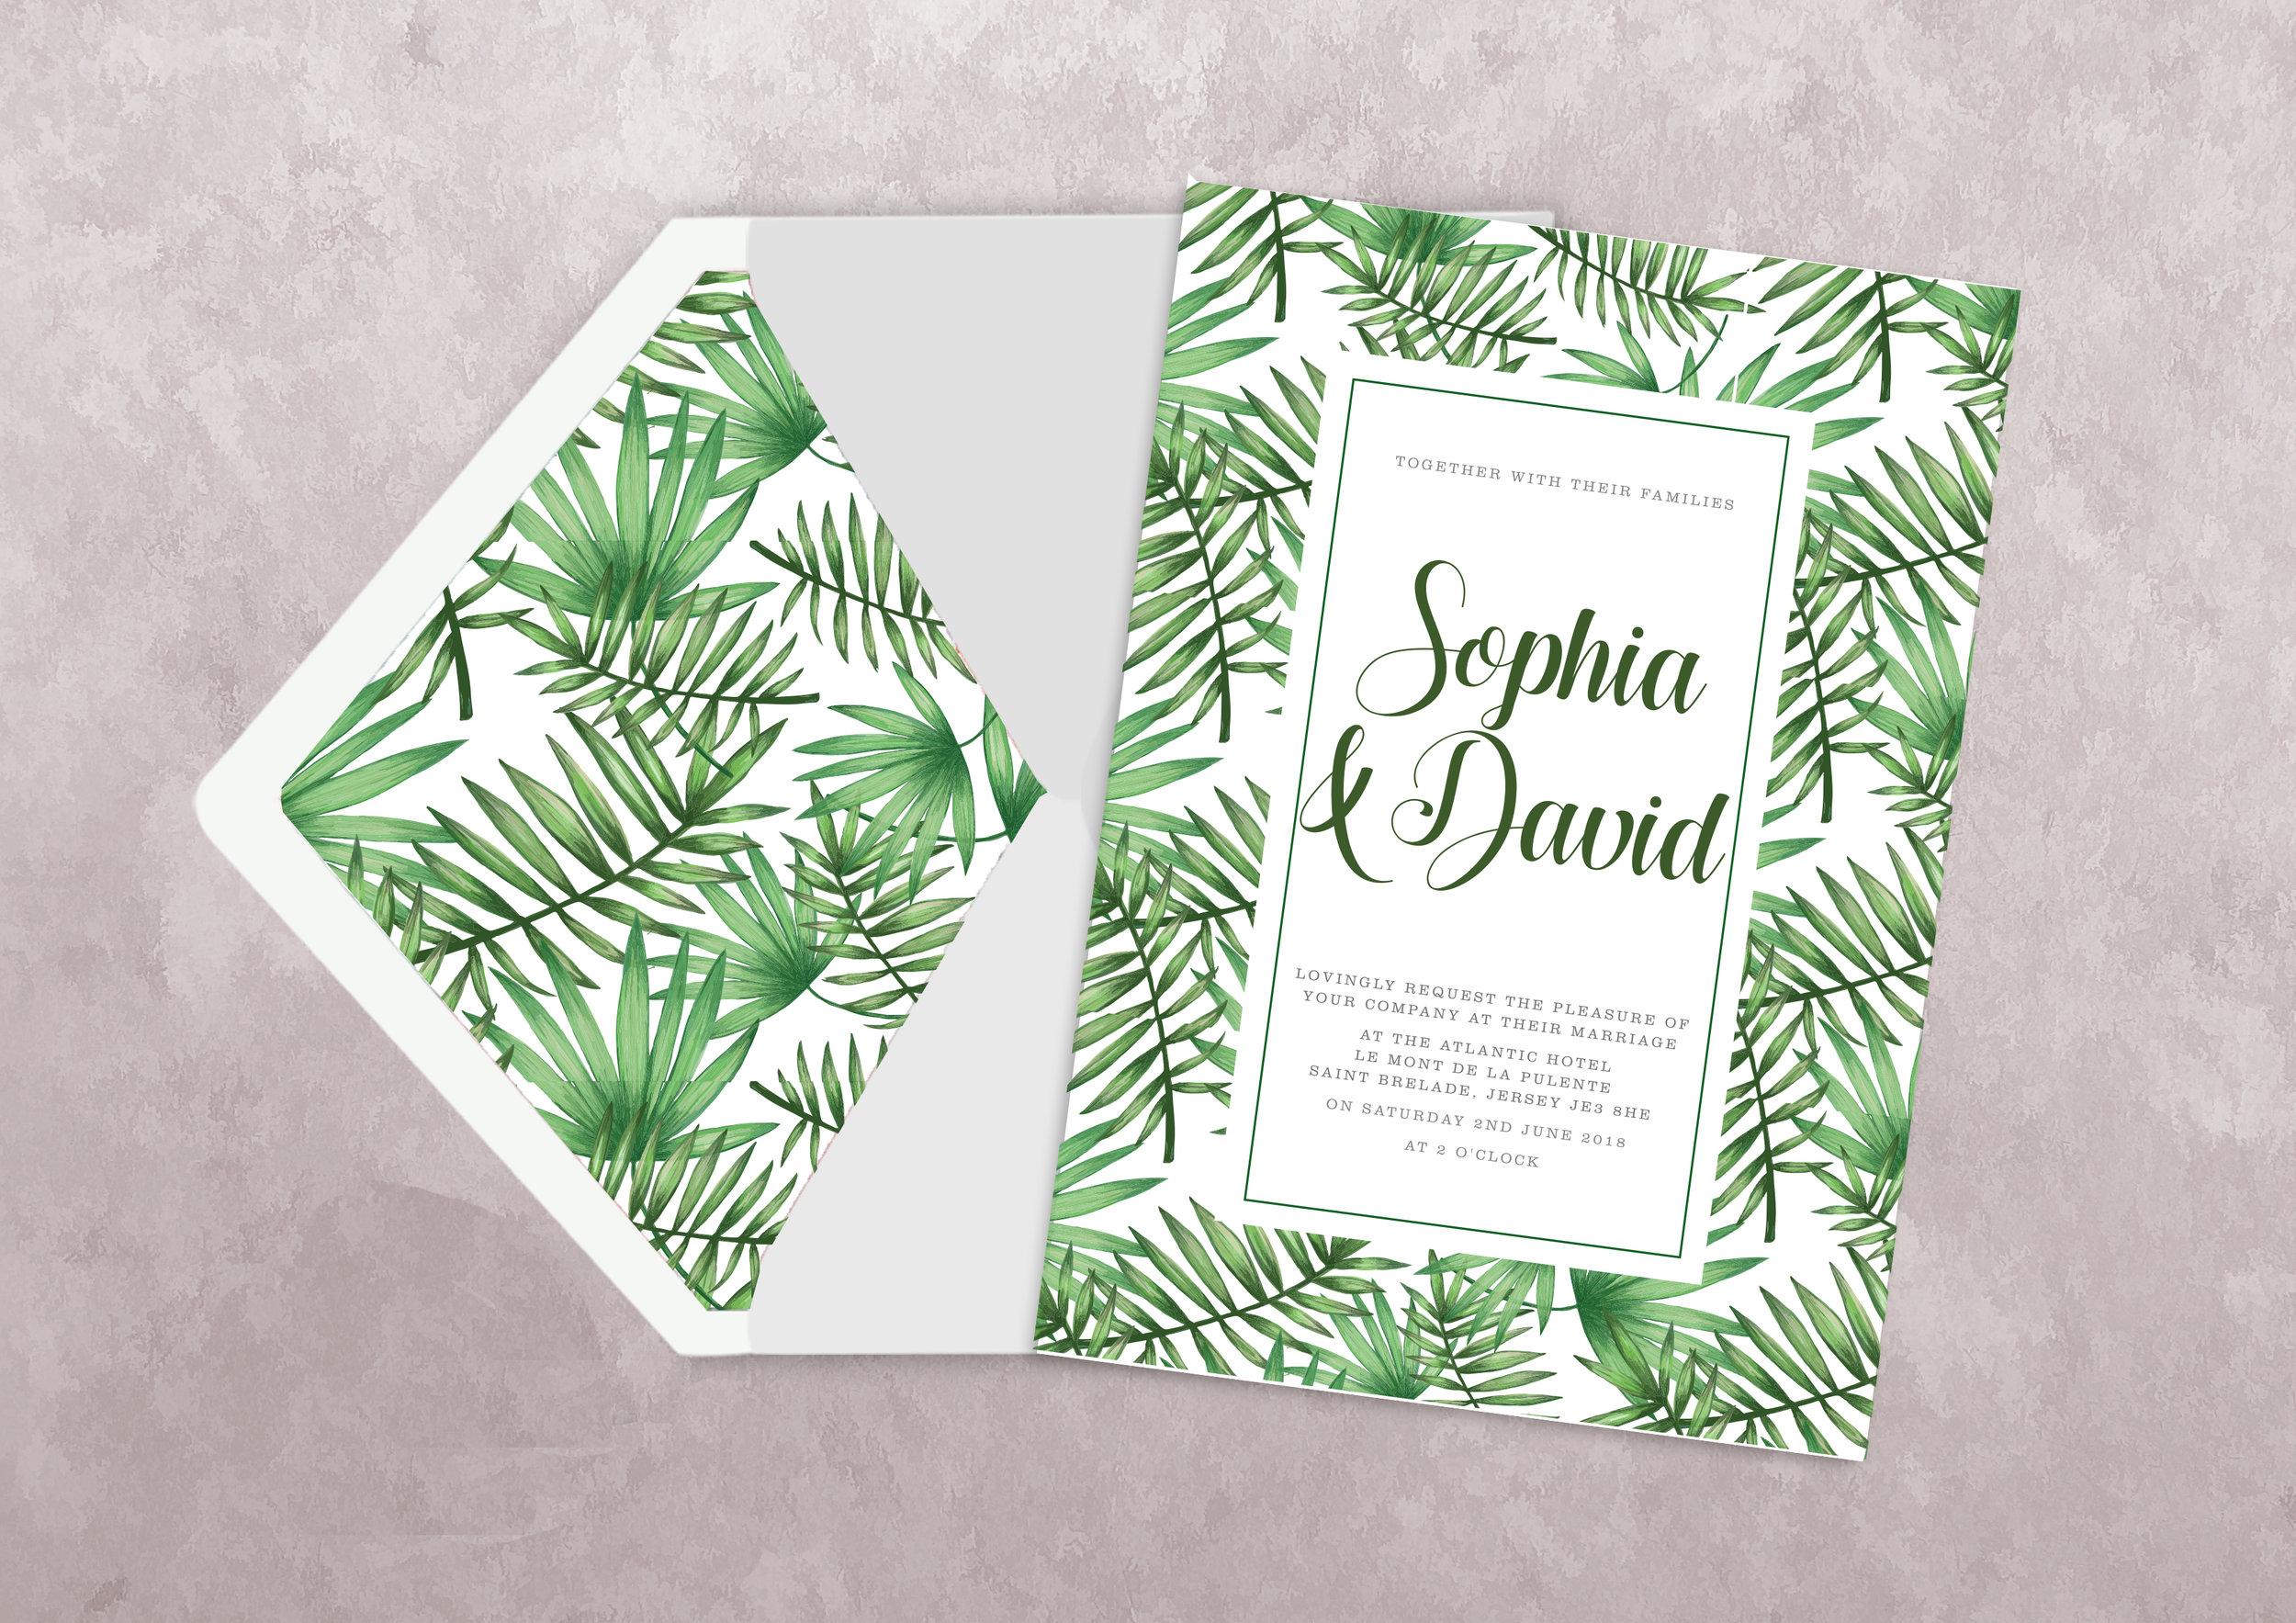 Offset/Litho printed wedding invitation